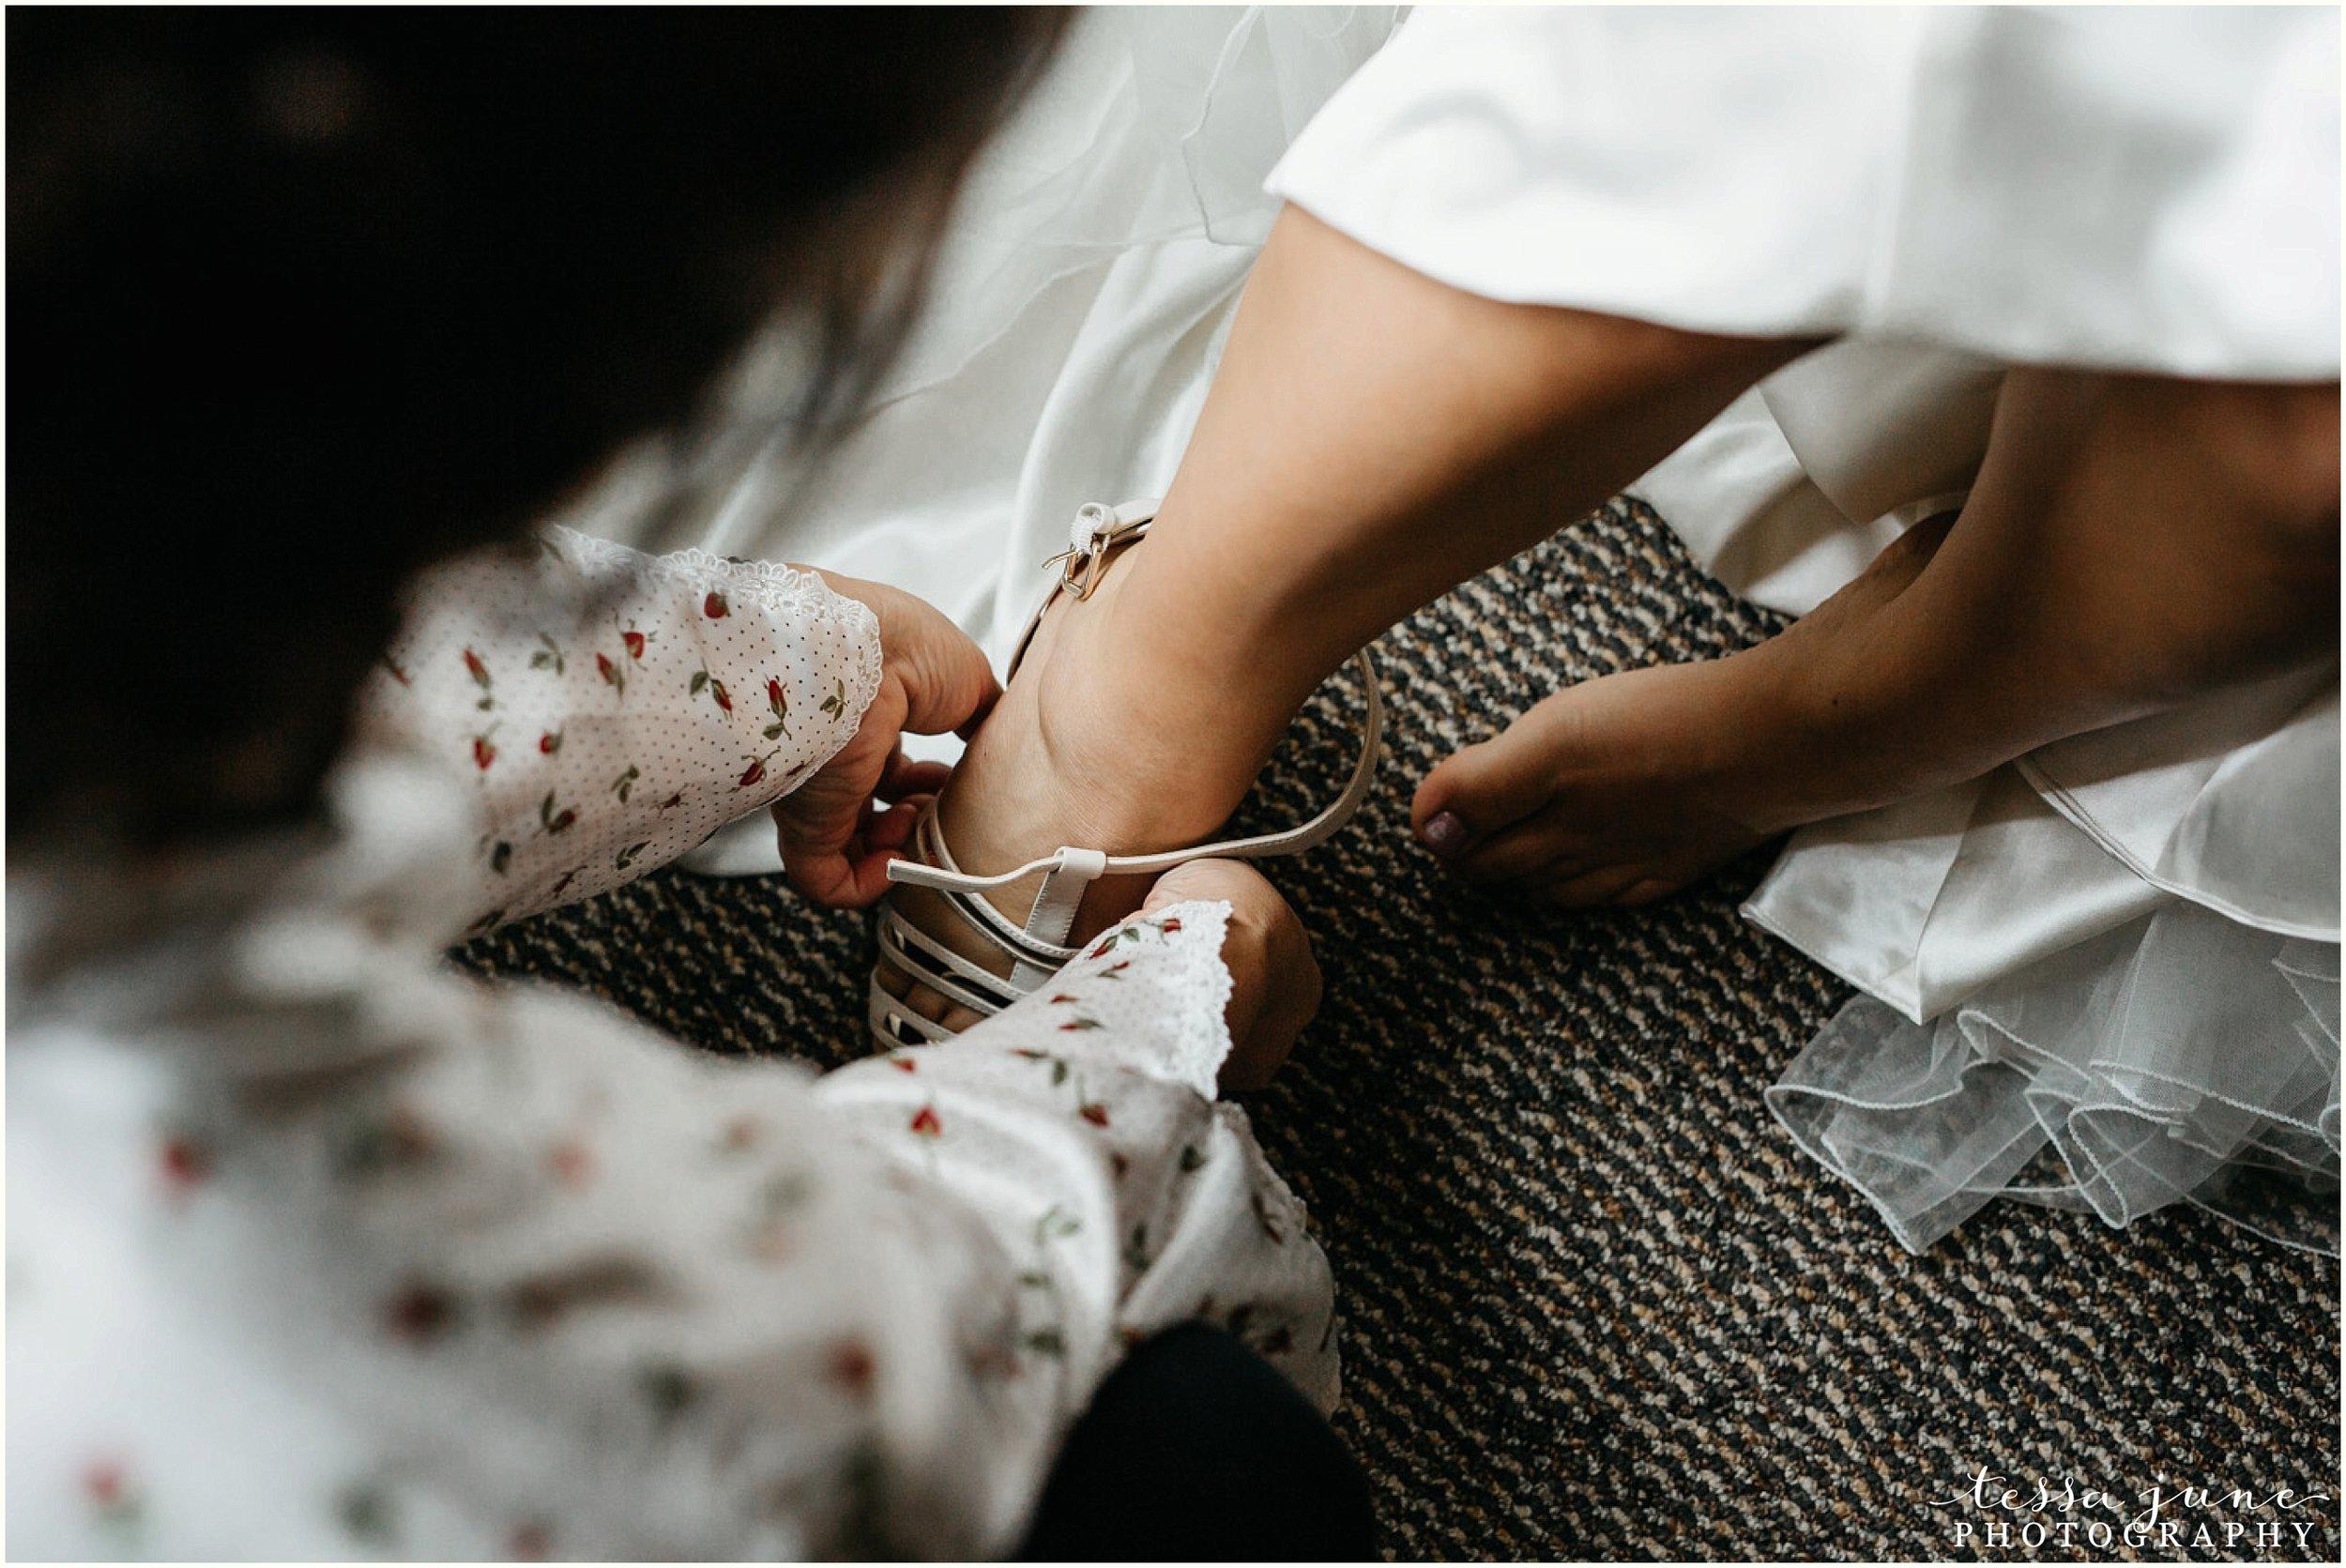 bohemian-minnesota-wedding-mismatched-bridesmaid-dresses-waterfall-st-cloud-tessa-june-photography-31.jpg